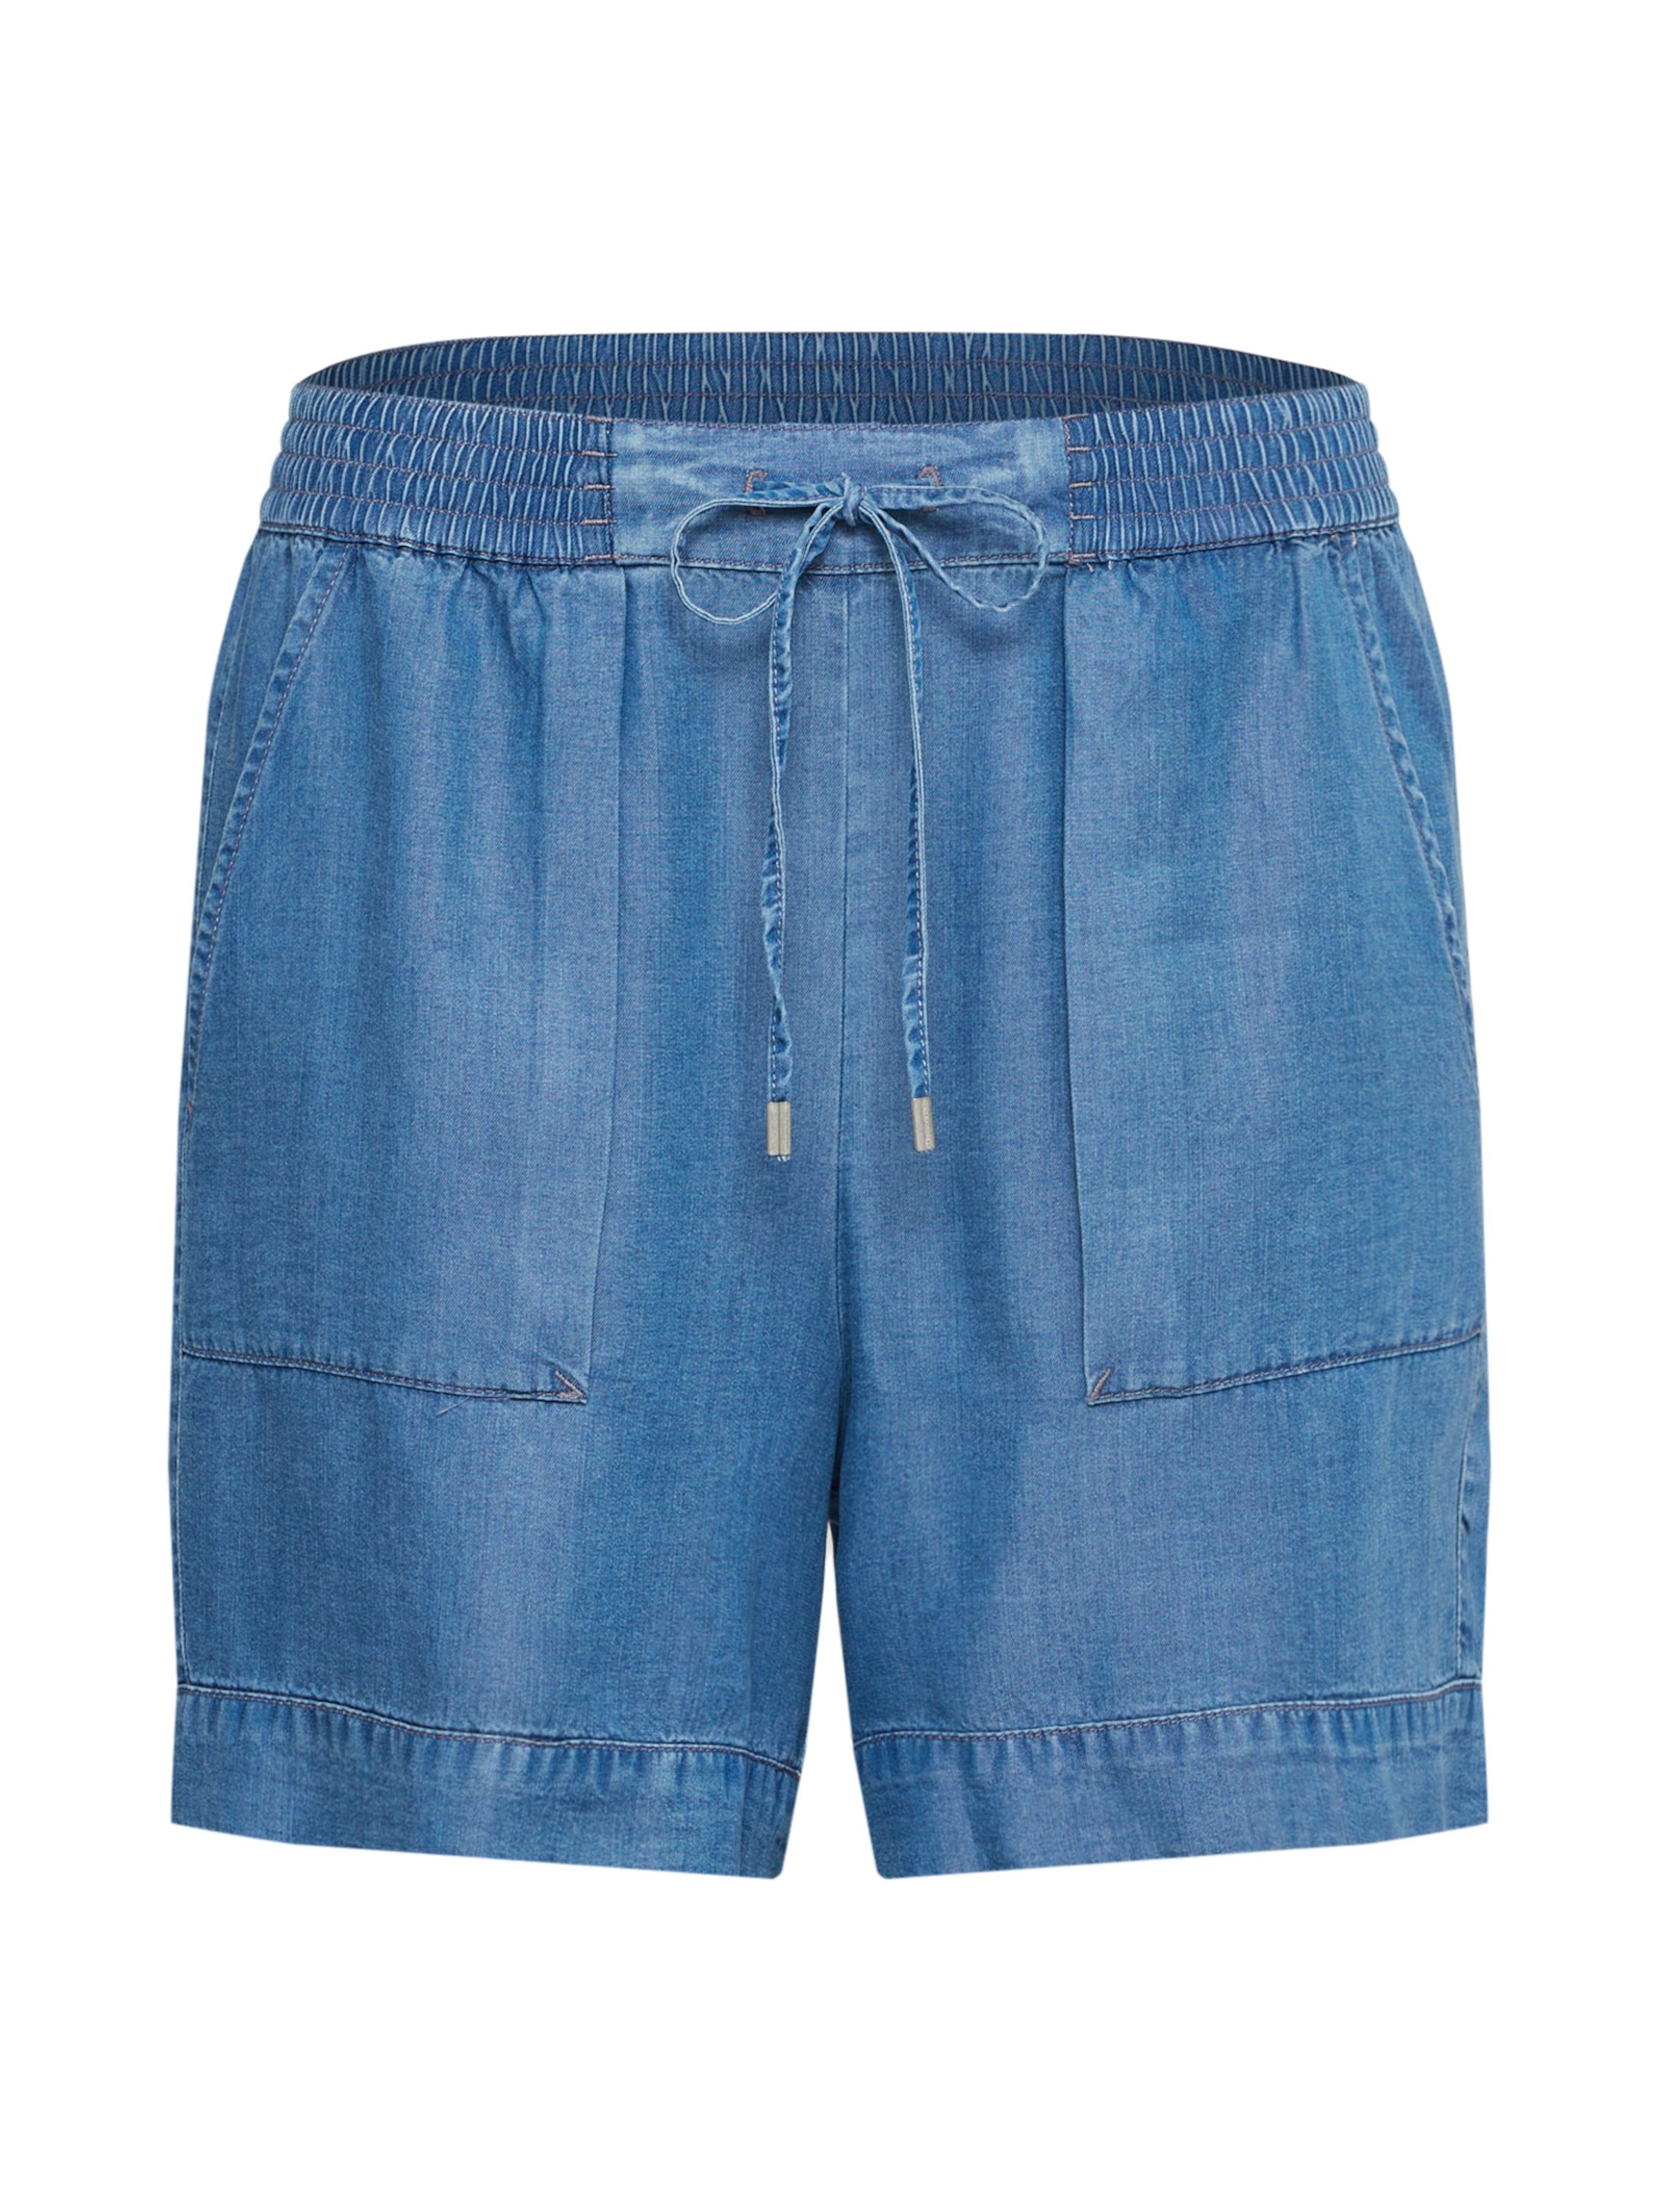 O'polo En Bleu Marc Pantalon Denim Nwyv8nOPm0